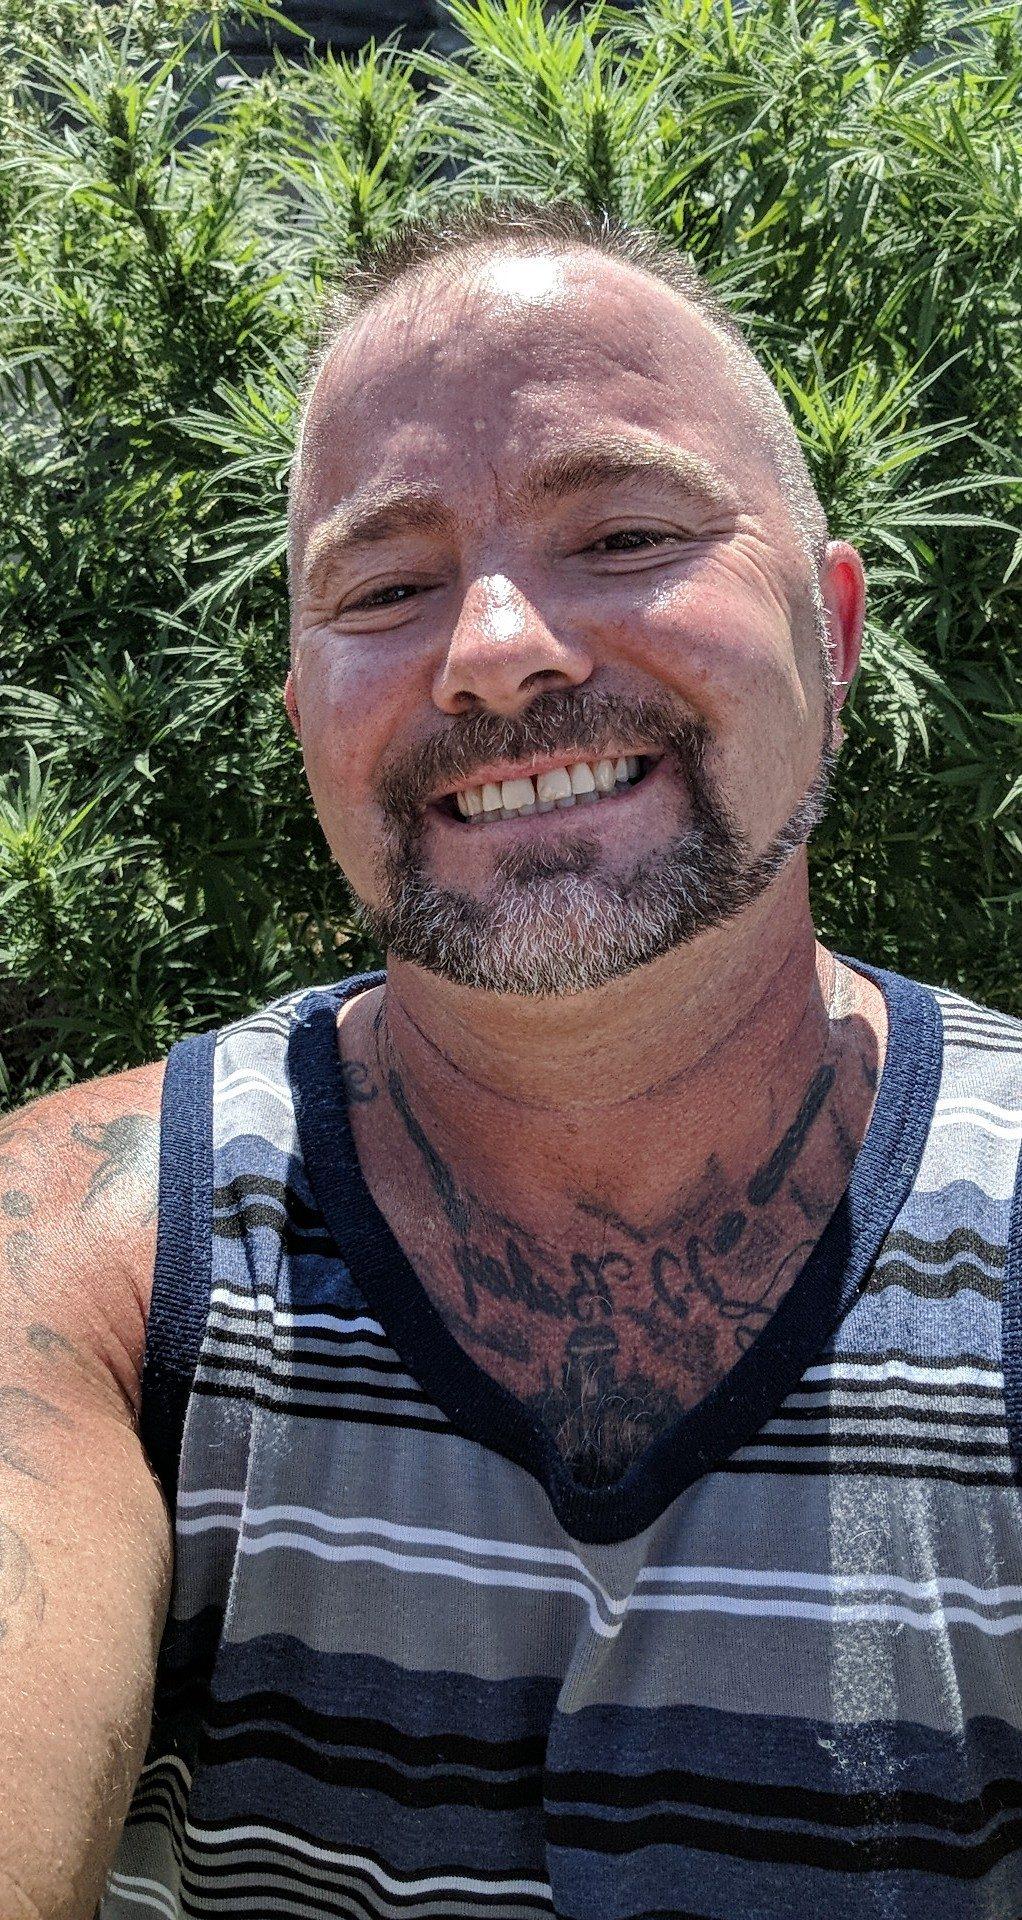 Cannabis as Medicine: Their Pills Made Me Suicidal